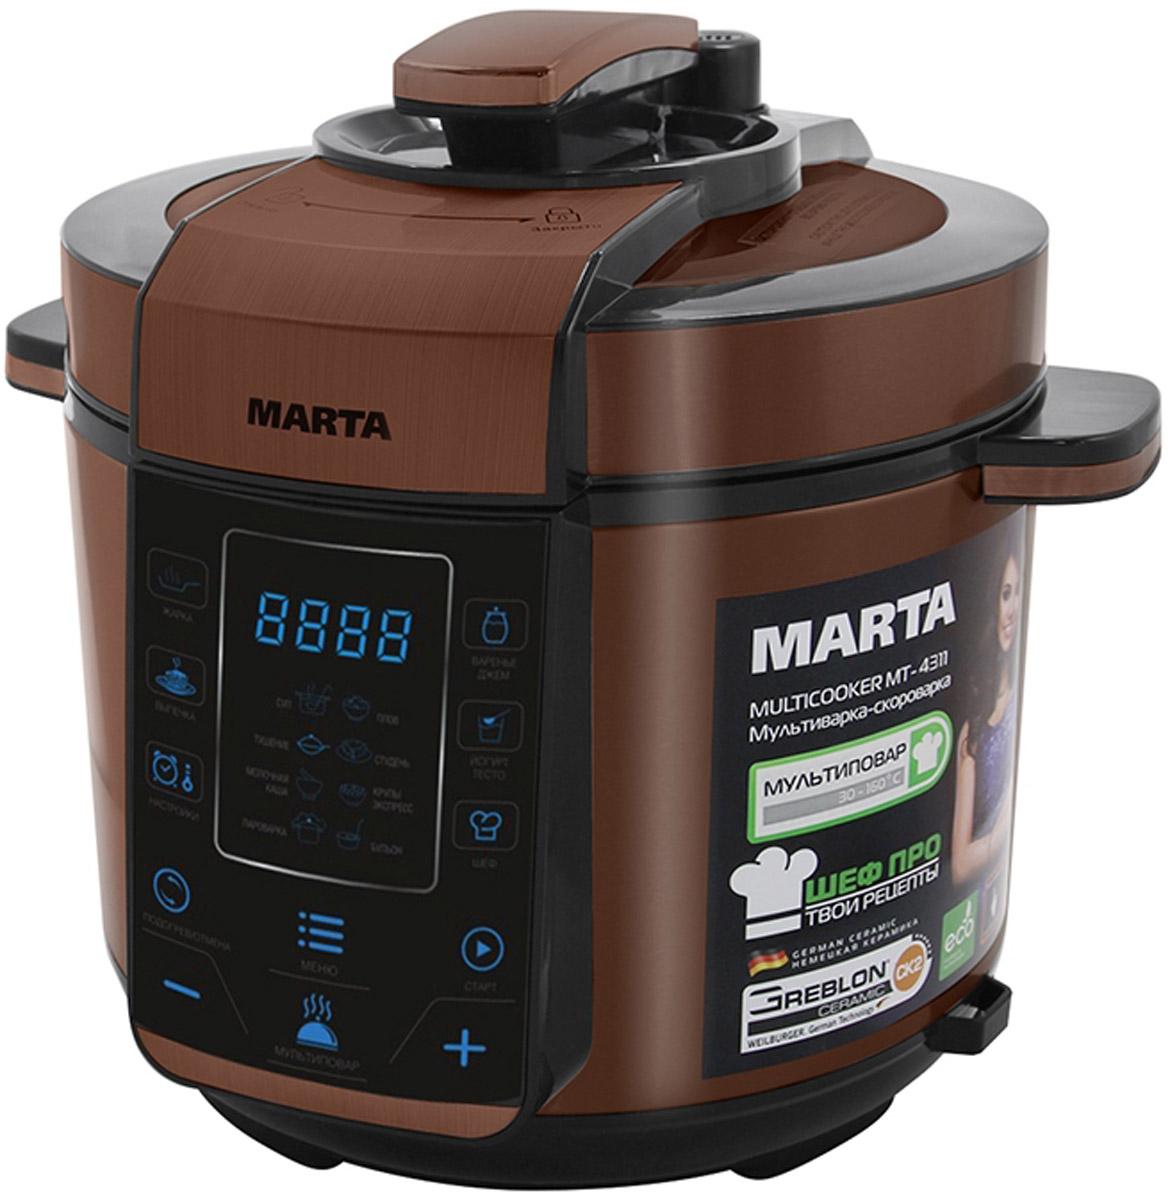 Marta MT-4311, Black Cooper мультиварка